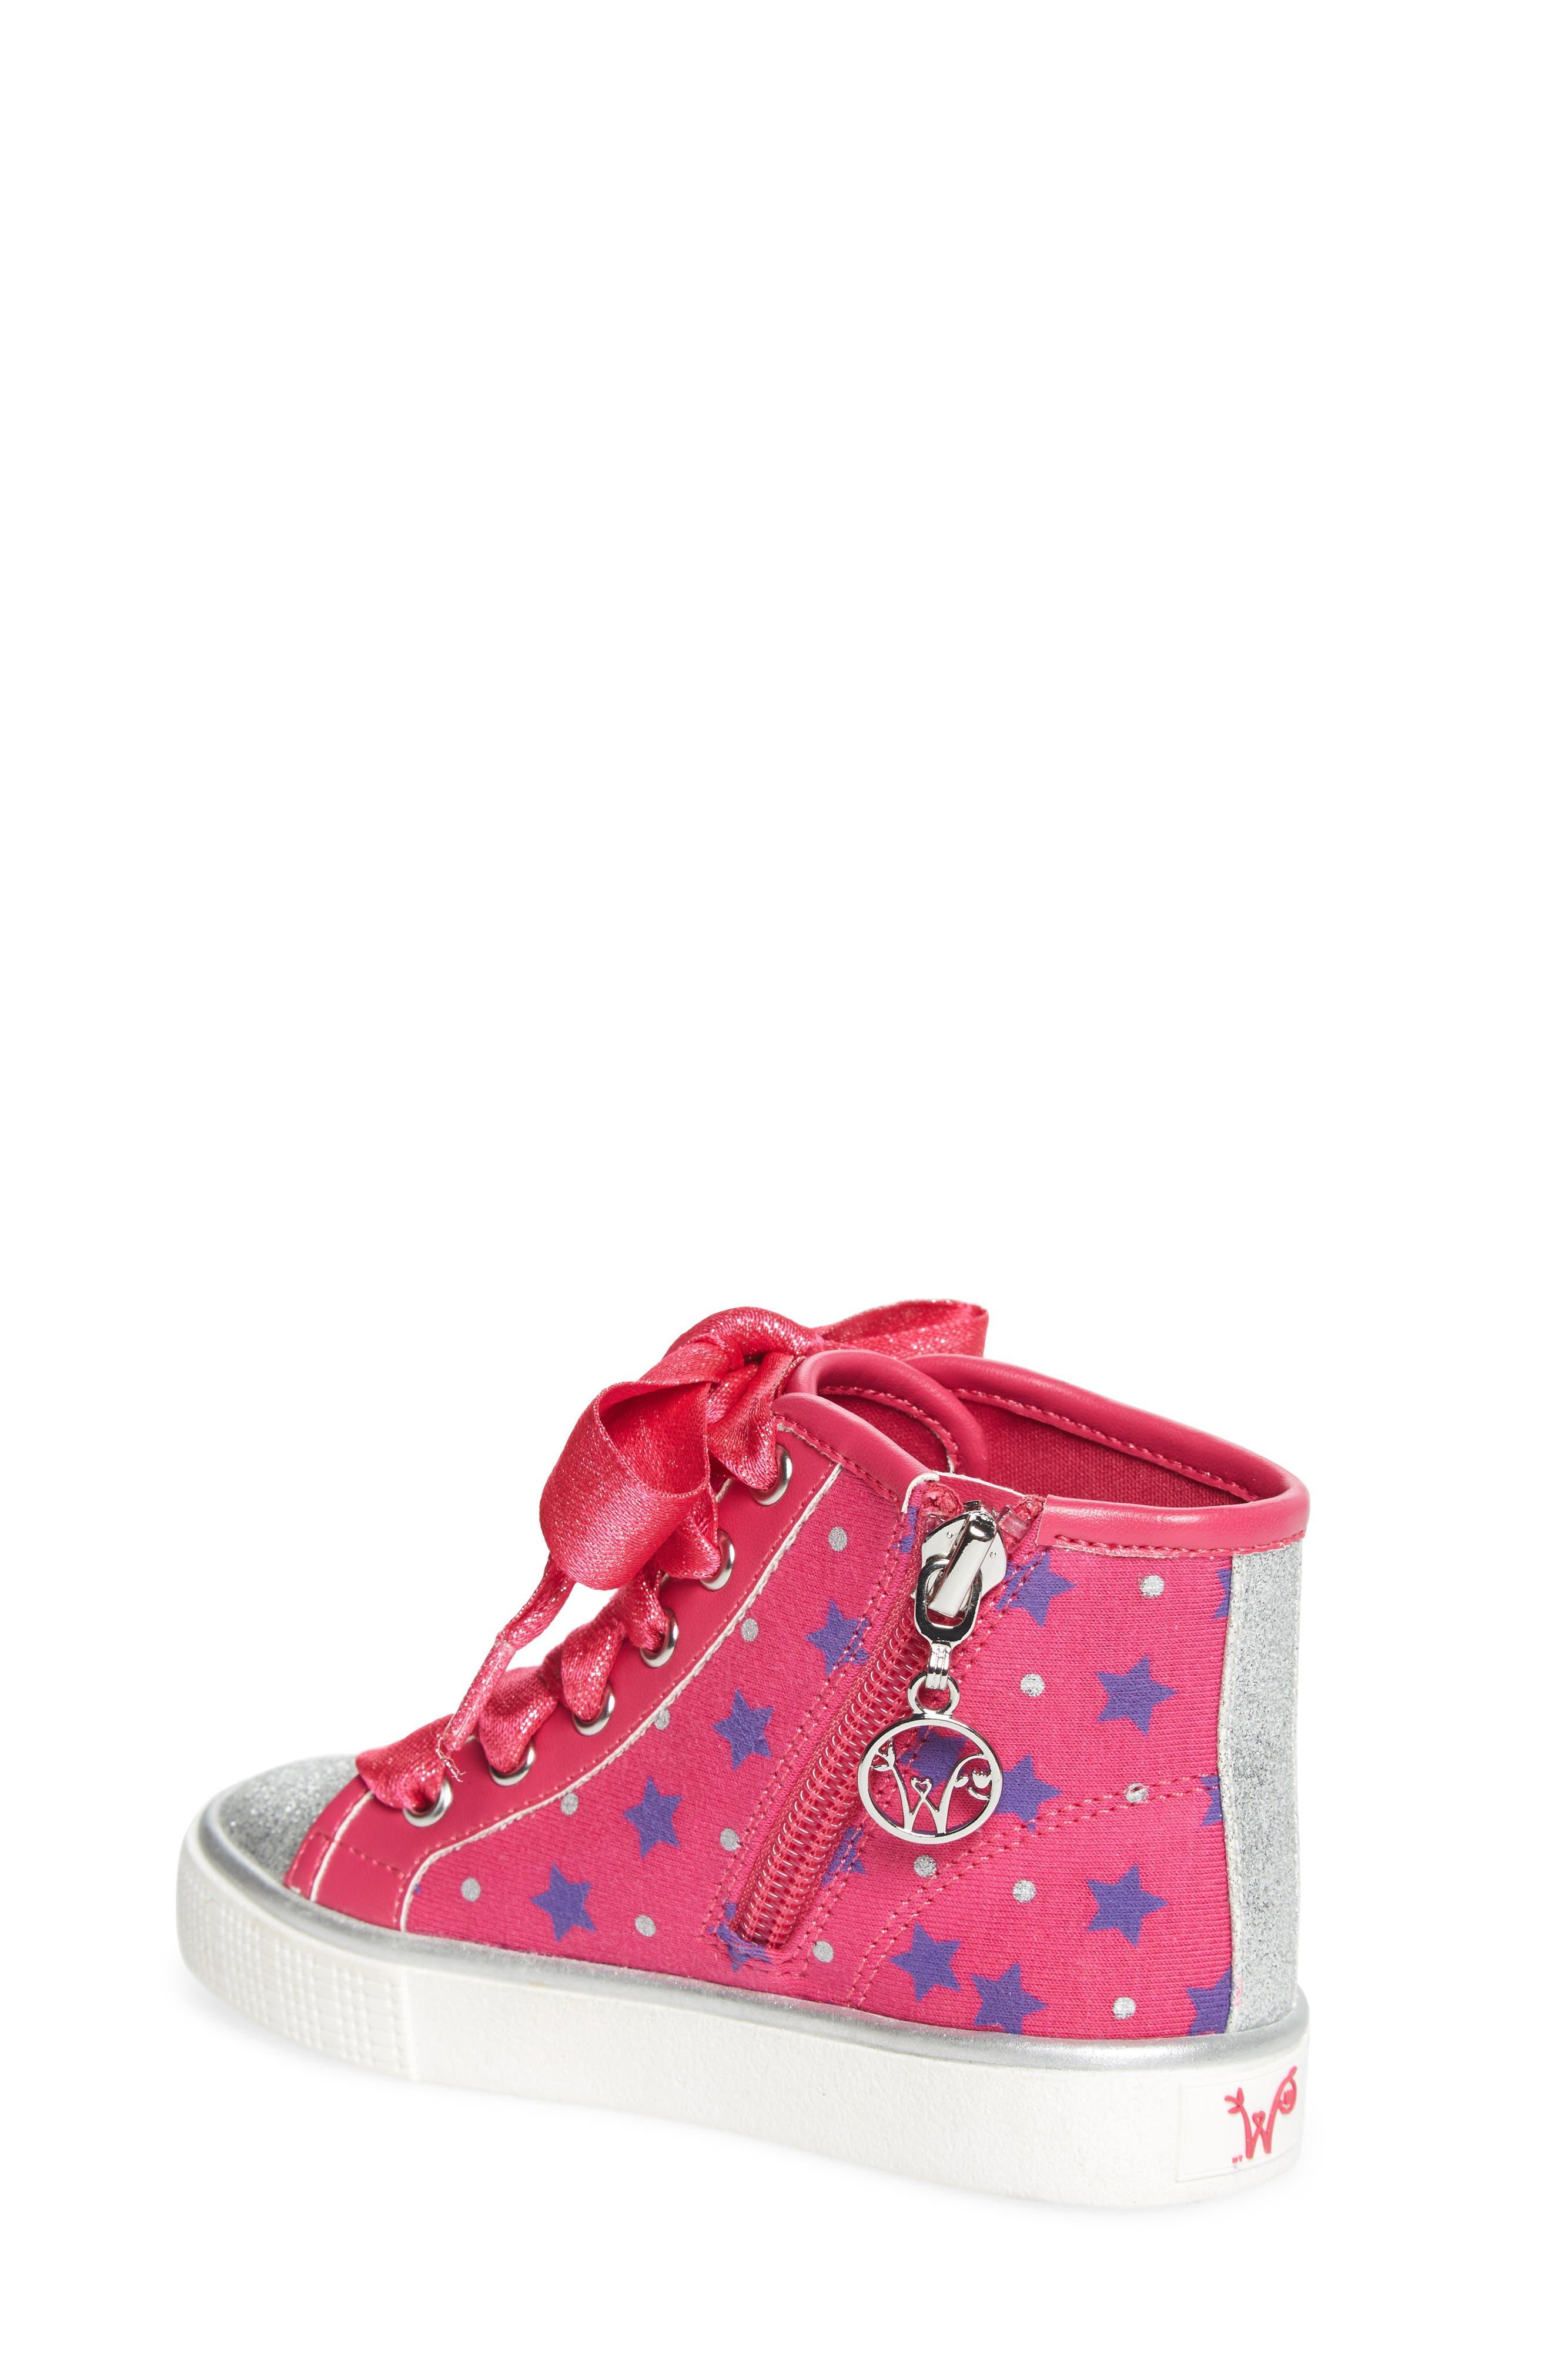 Emerson High Top Sneaker,                             Alternate thumbnail 2, color,                             Pink/ Purple